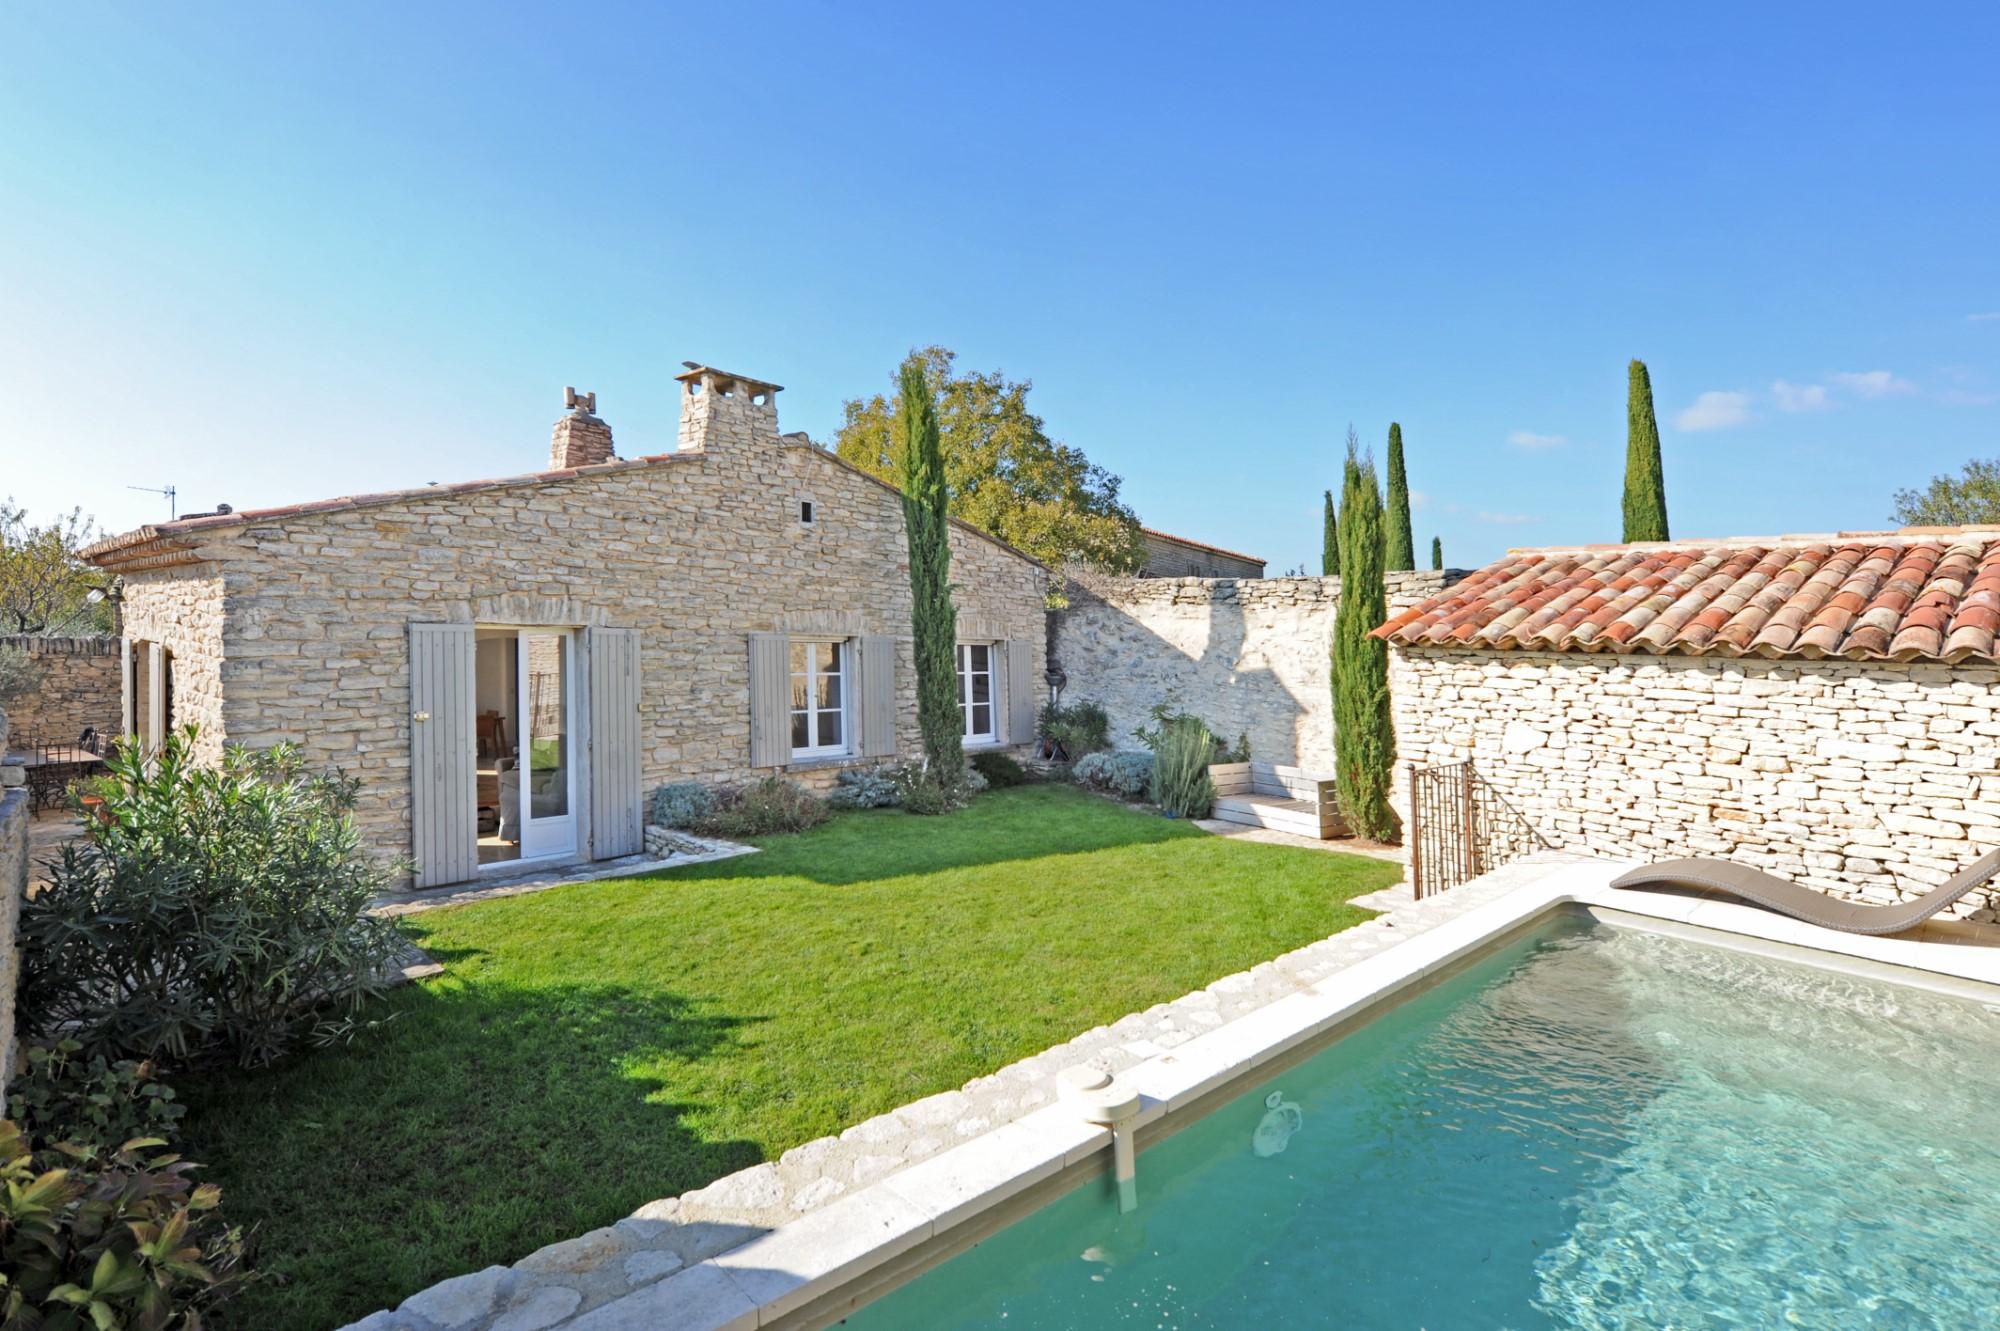 ventes en luberon vendre maison de charme ave piscine jardin et terrasse agence rosier